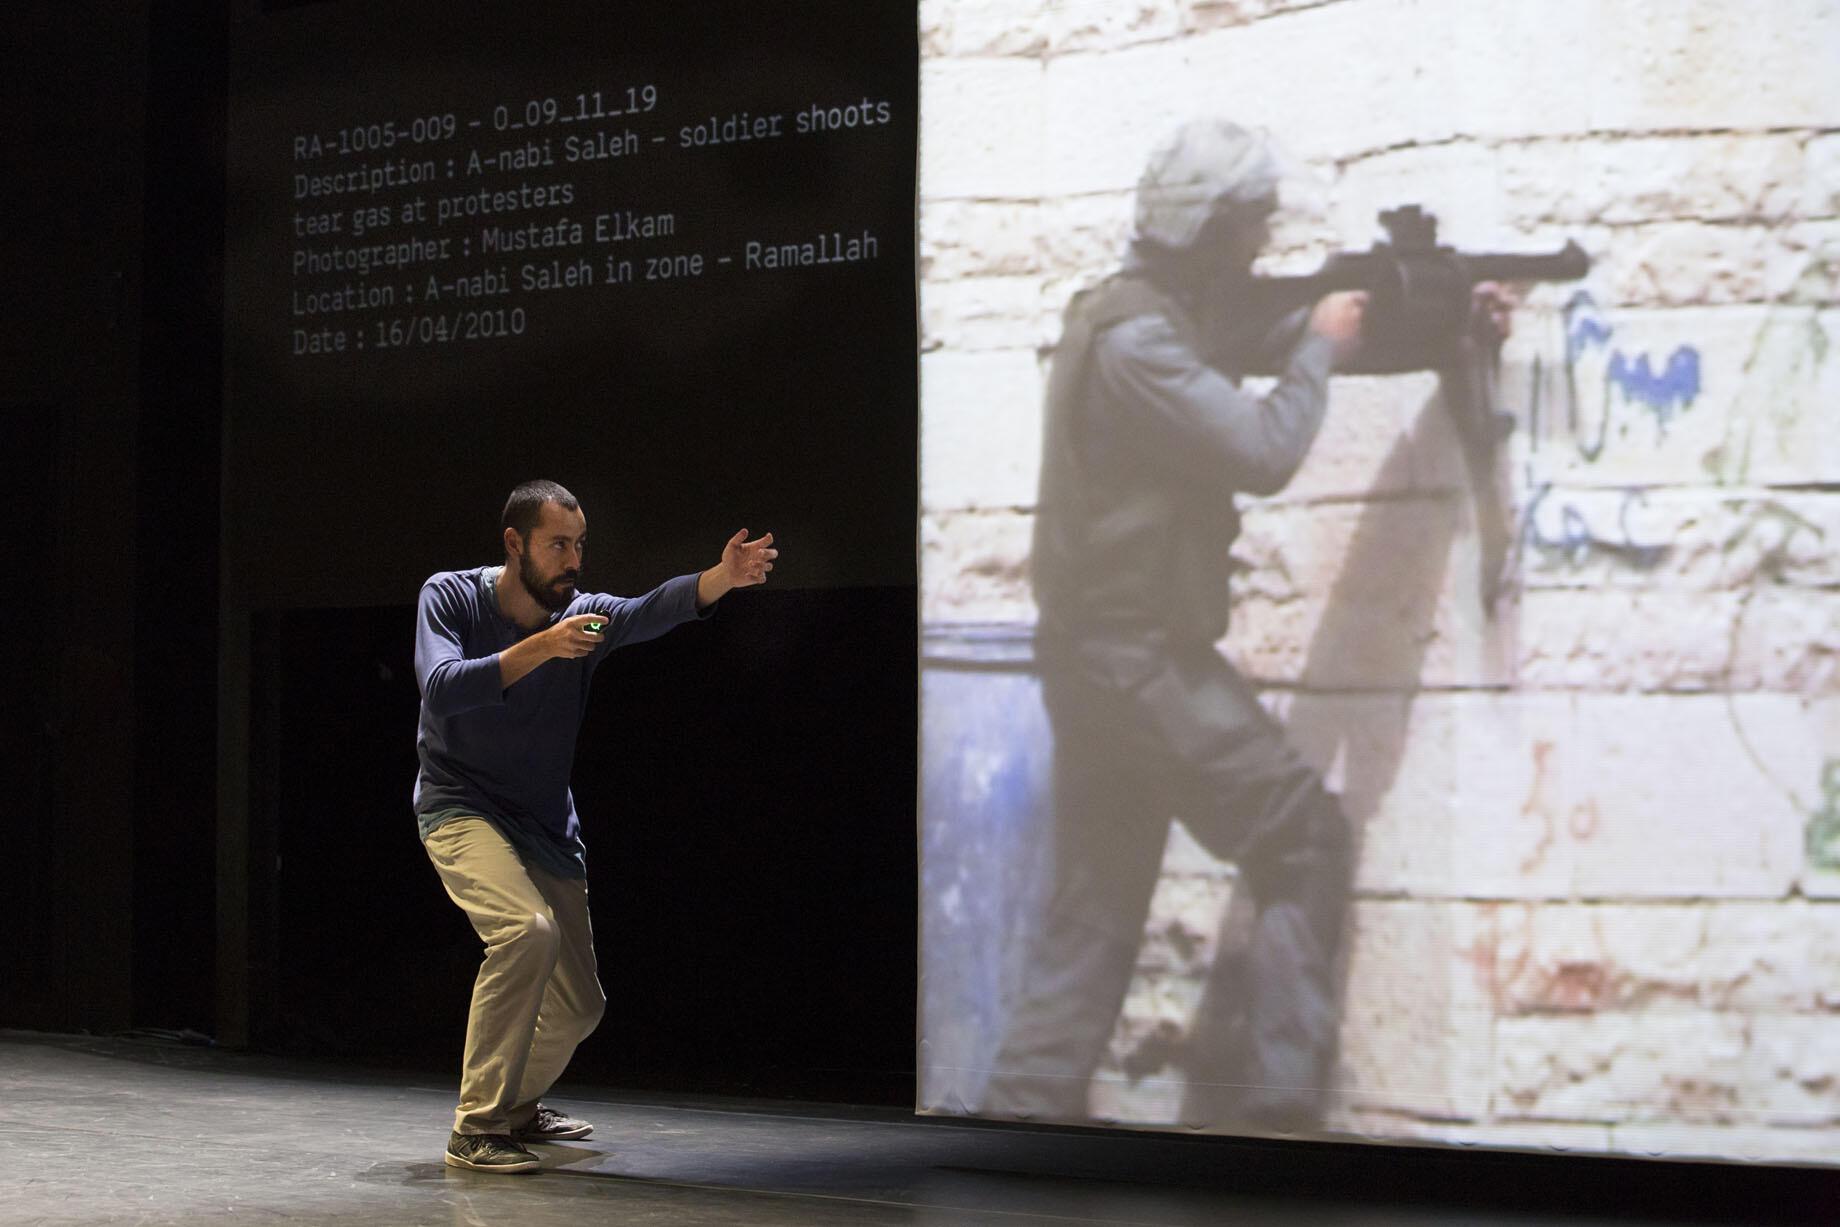 O coreógrafo Arkadi Zaides utiliza vídeos e expressão corporal em seu espetáculo Archives no Festival de Avignon